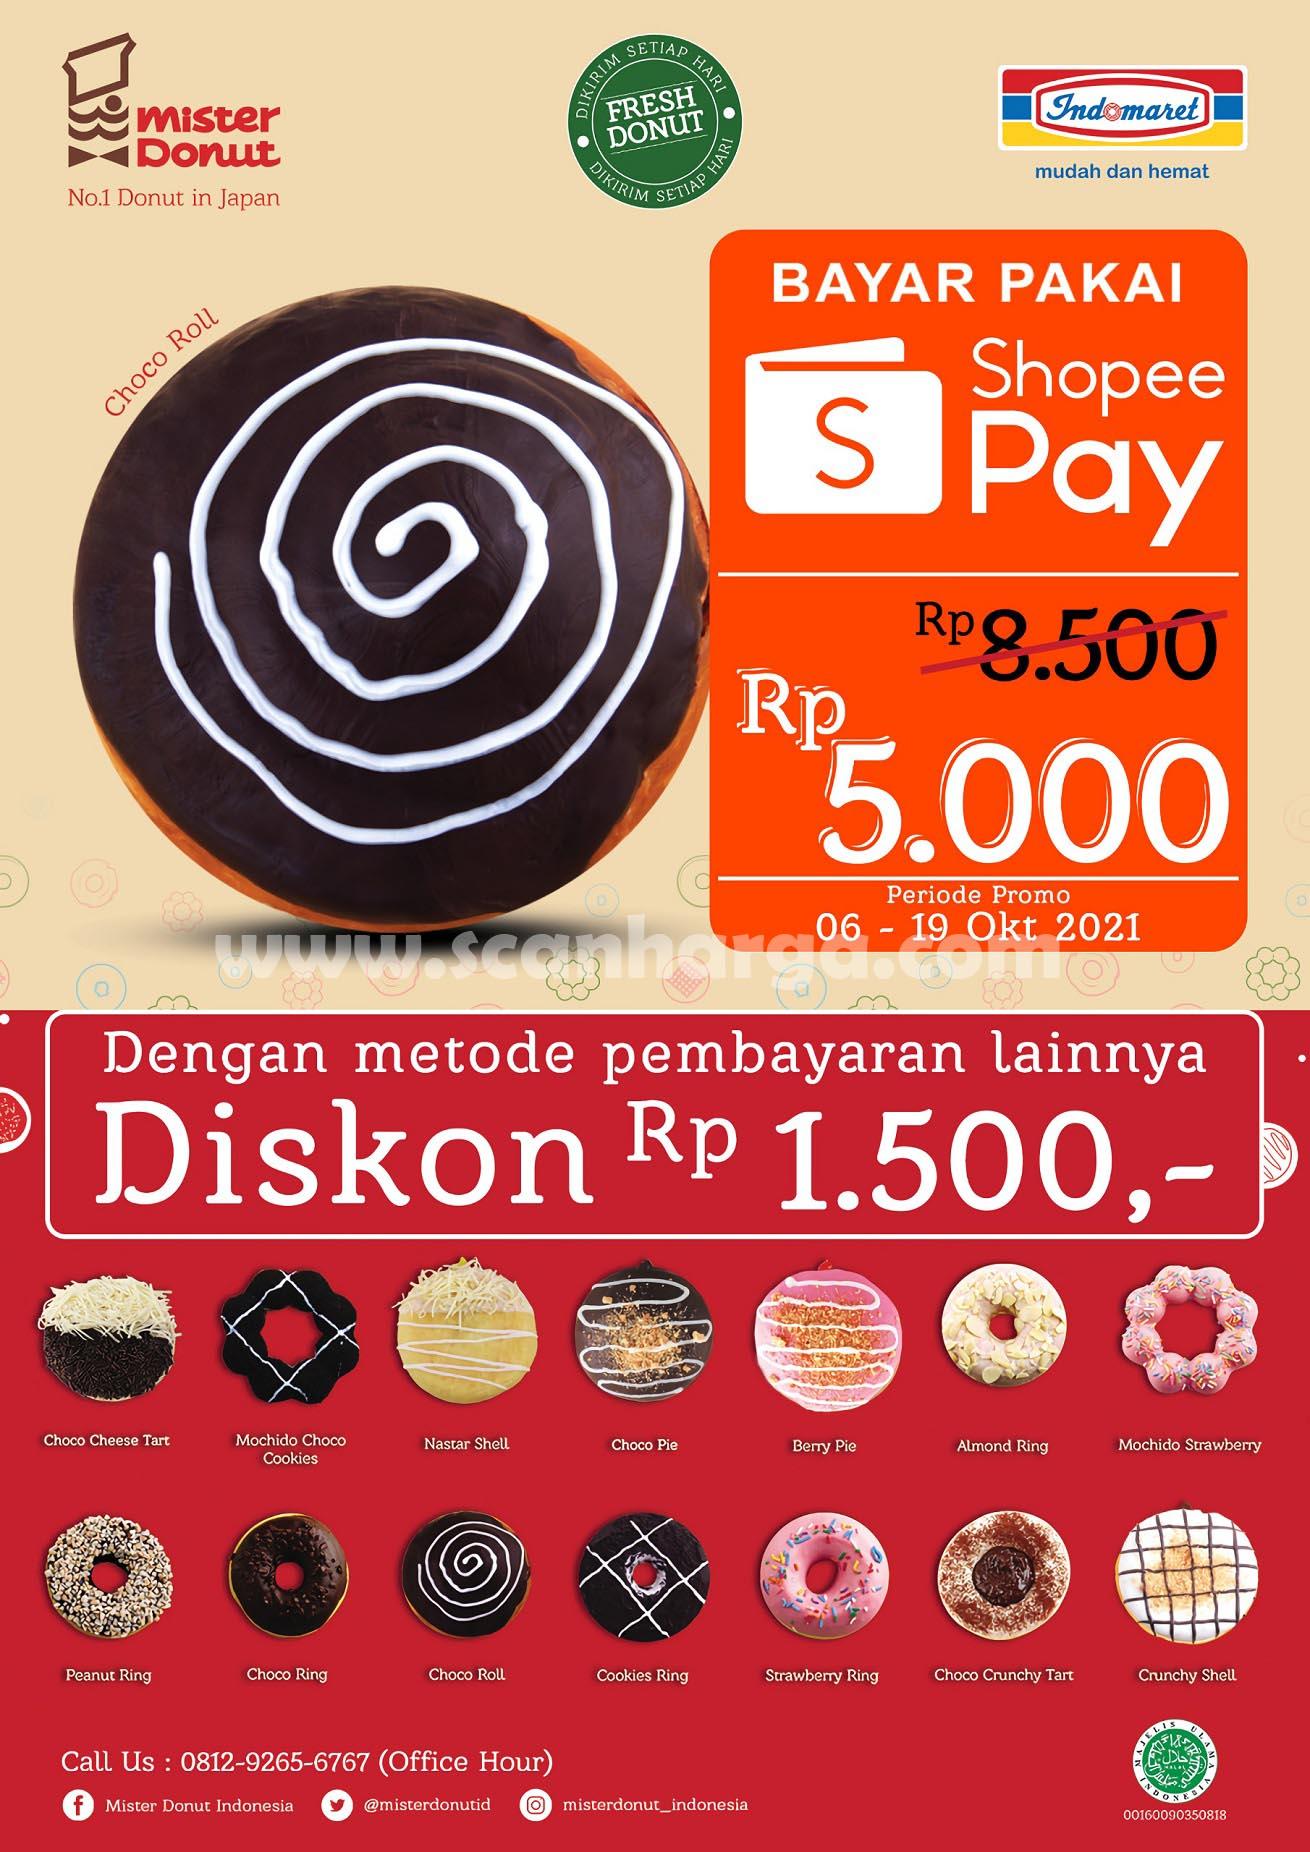 Promo Mister Donut Choco Roll cuma Rp. 5.000 pakai Shopeepay